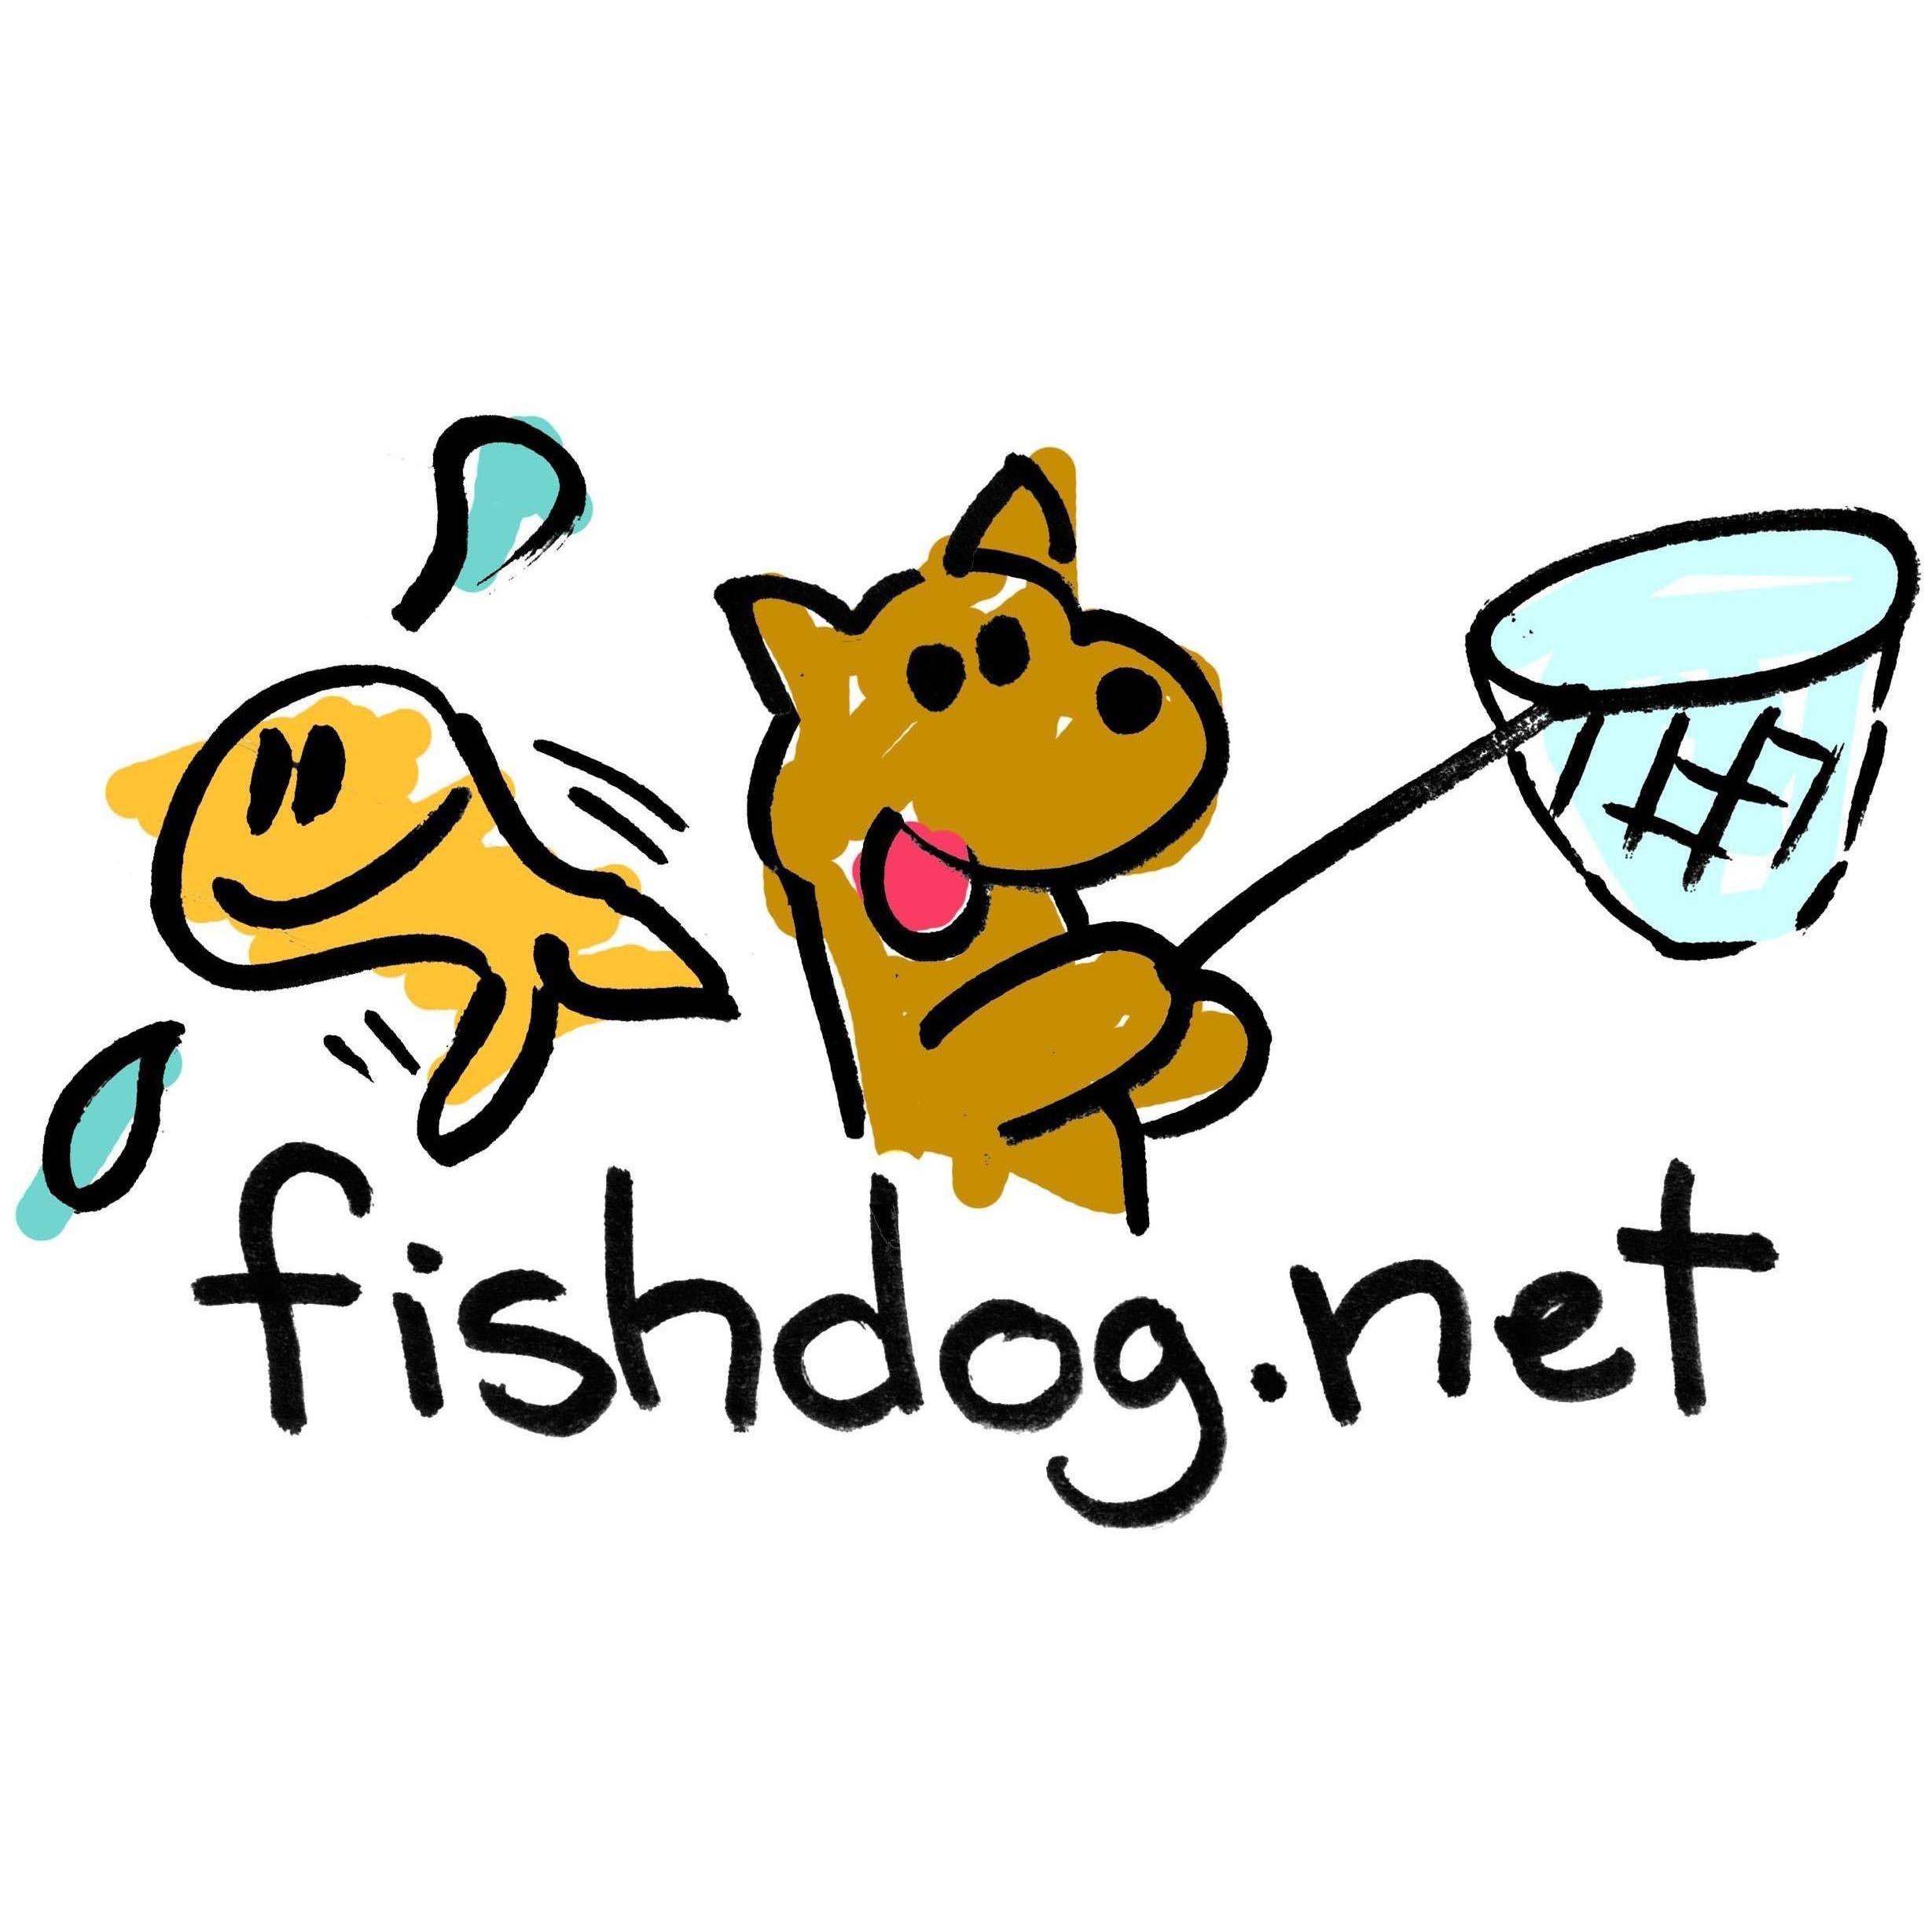 fishdog.net image 1